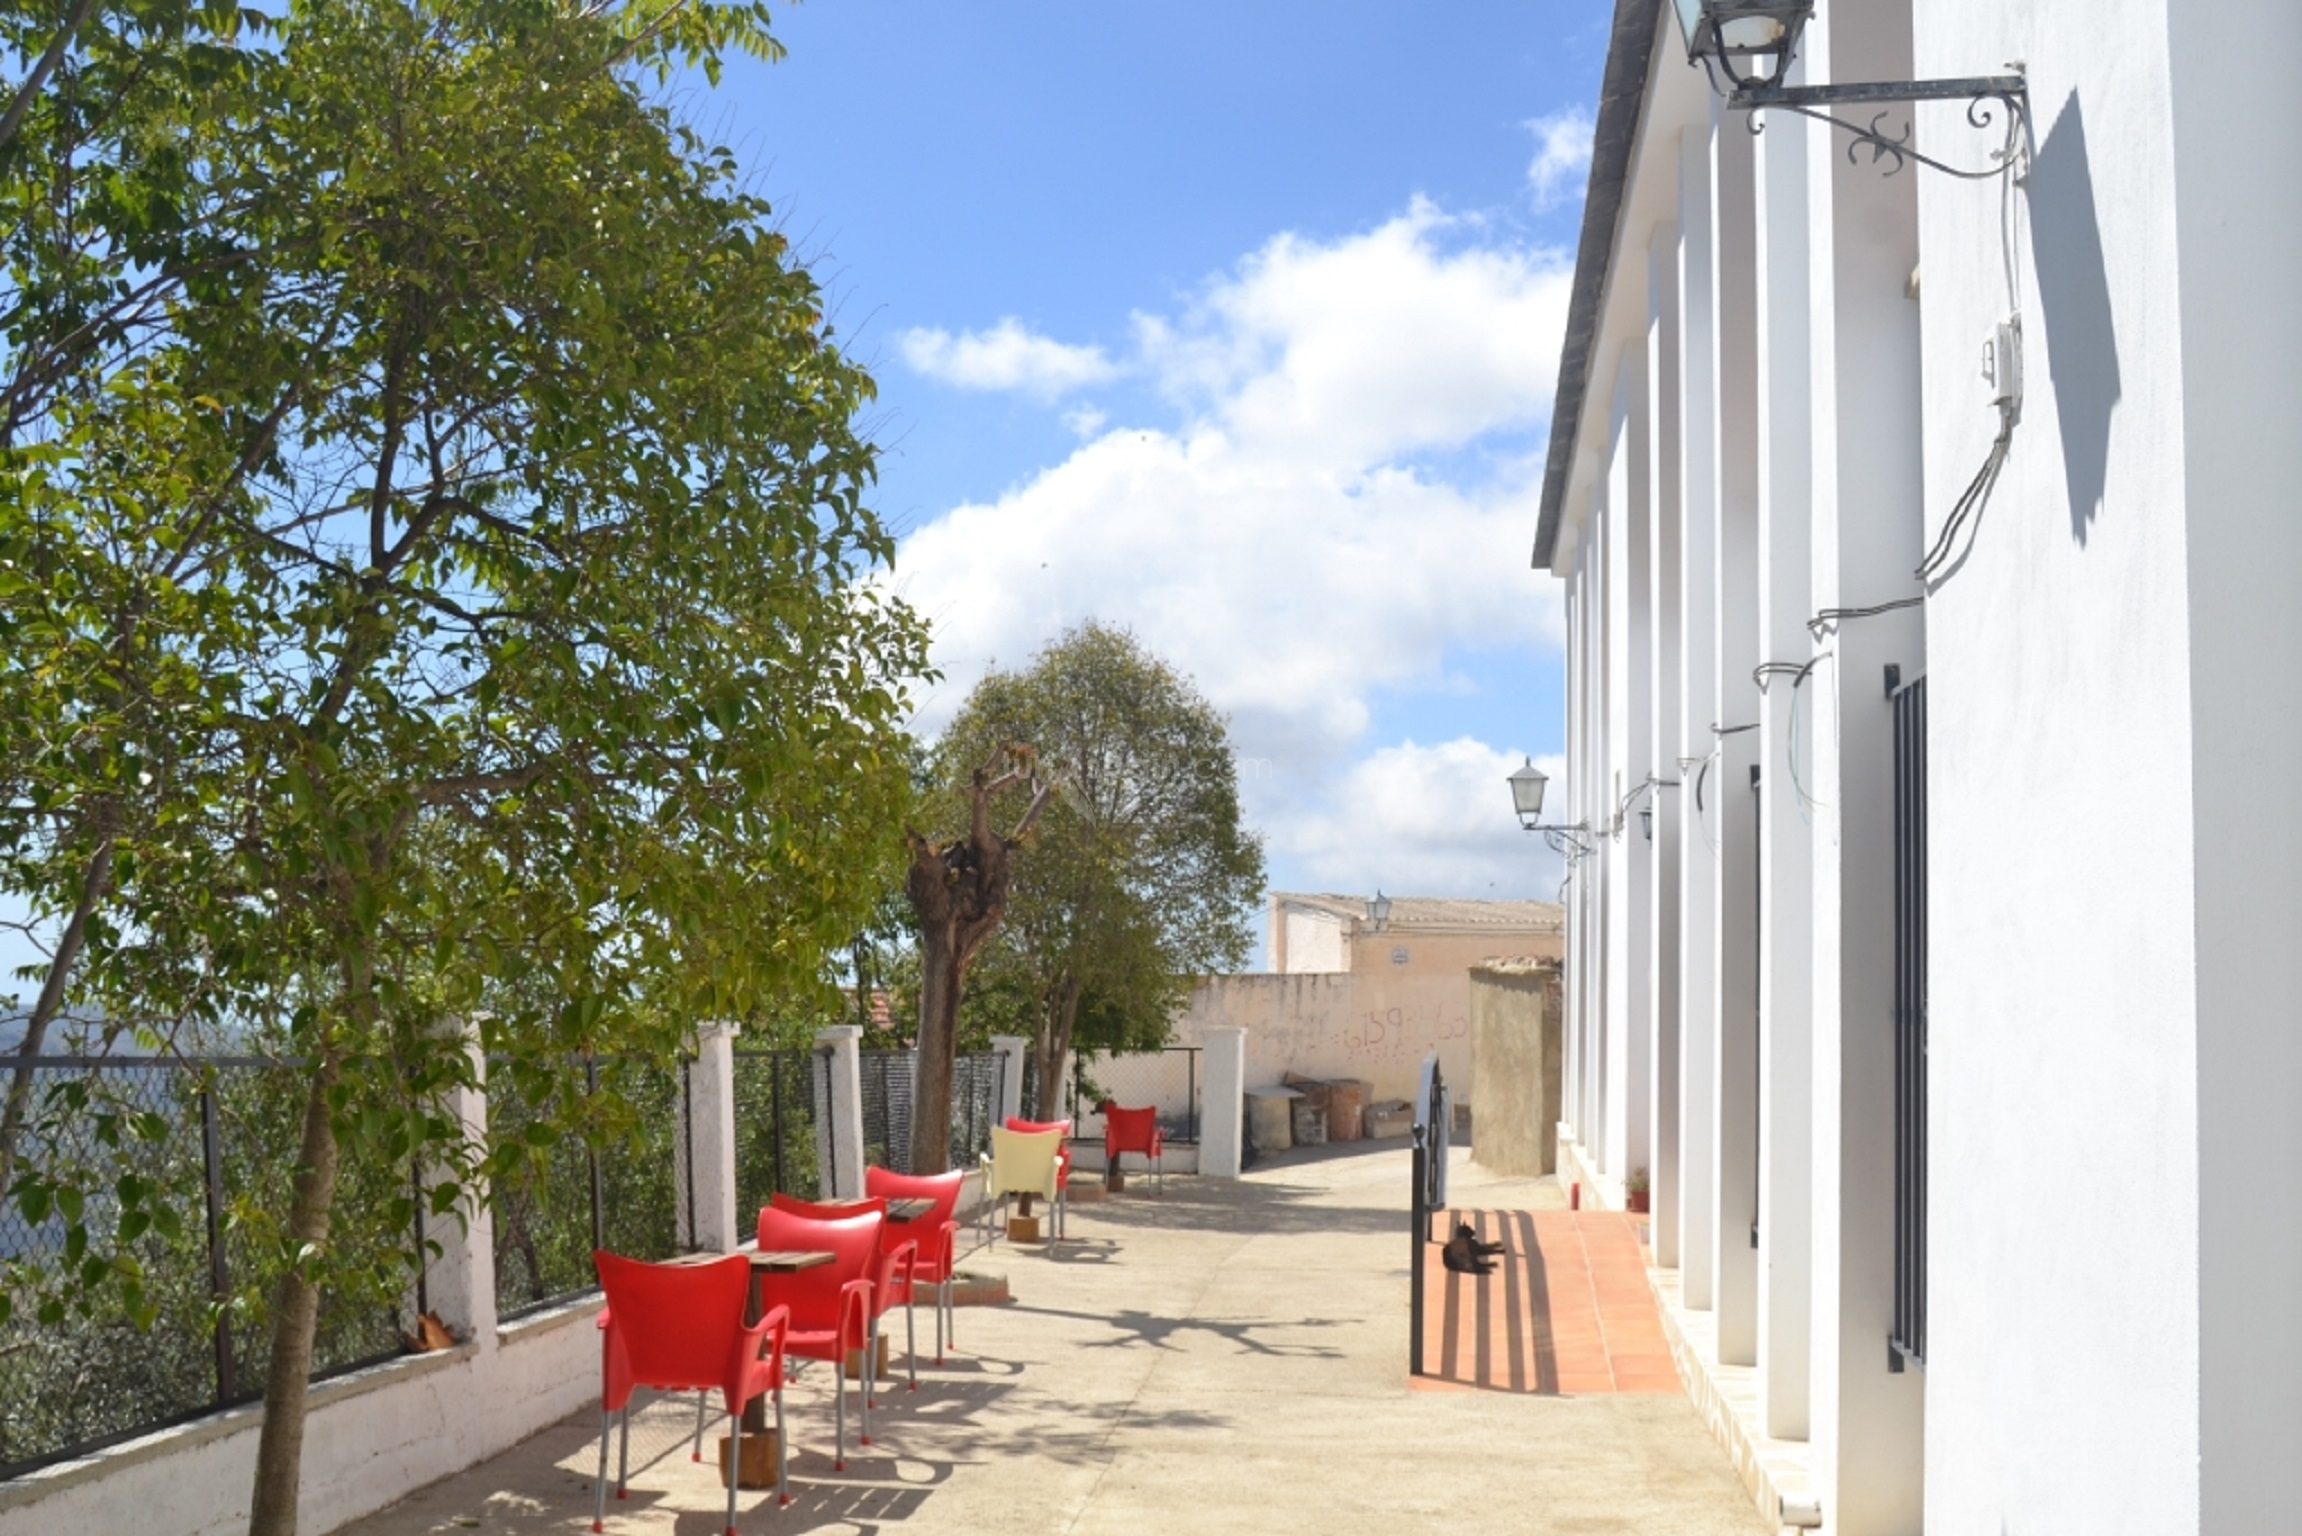 Hostal y terraza